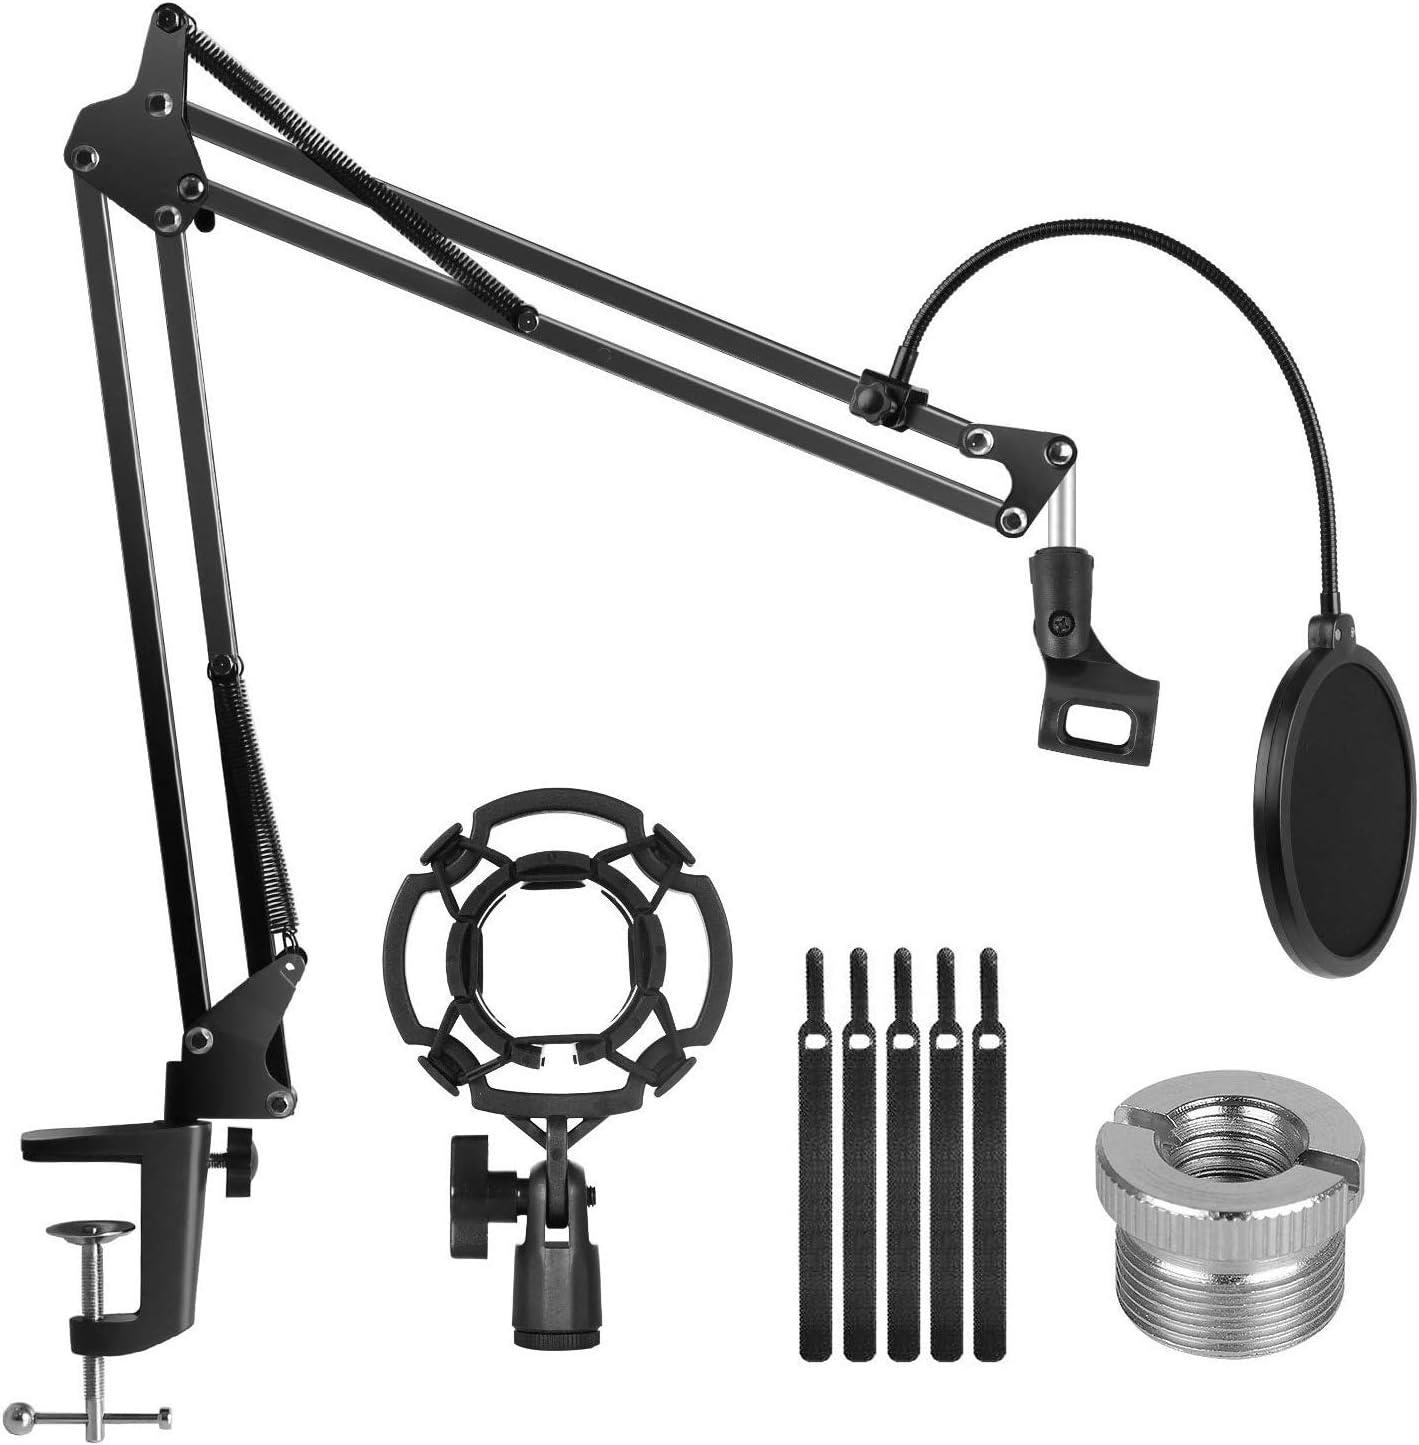 InnoGear Adjustable Suspension Boom Scissor Arm Microphone Stand